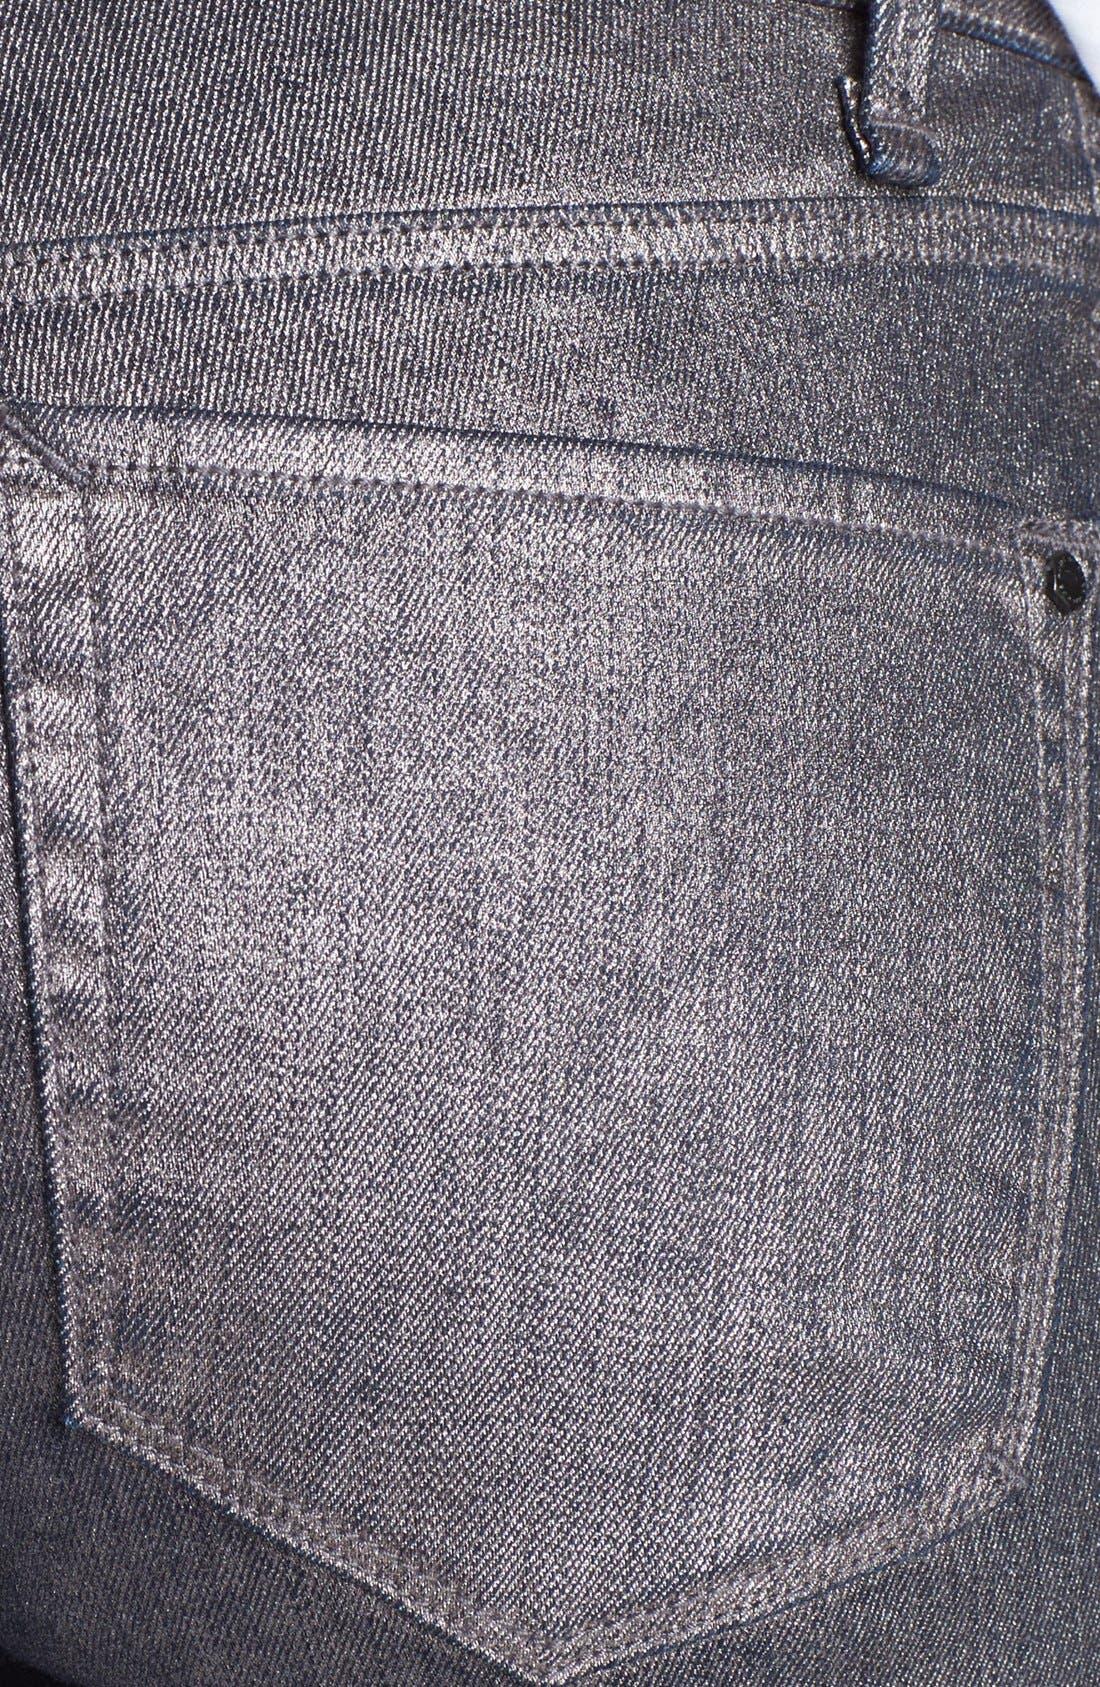 Alternate Image 3  - MARC BY MARC JACOBS Seamed Cigarette Leg Jeans (Gunmetal)